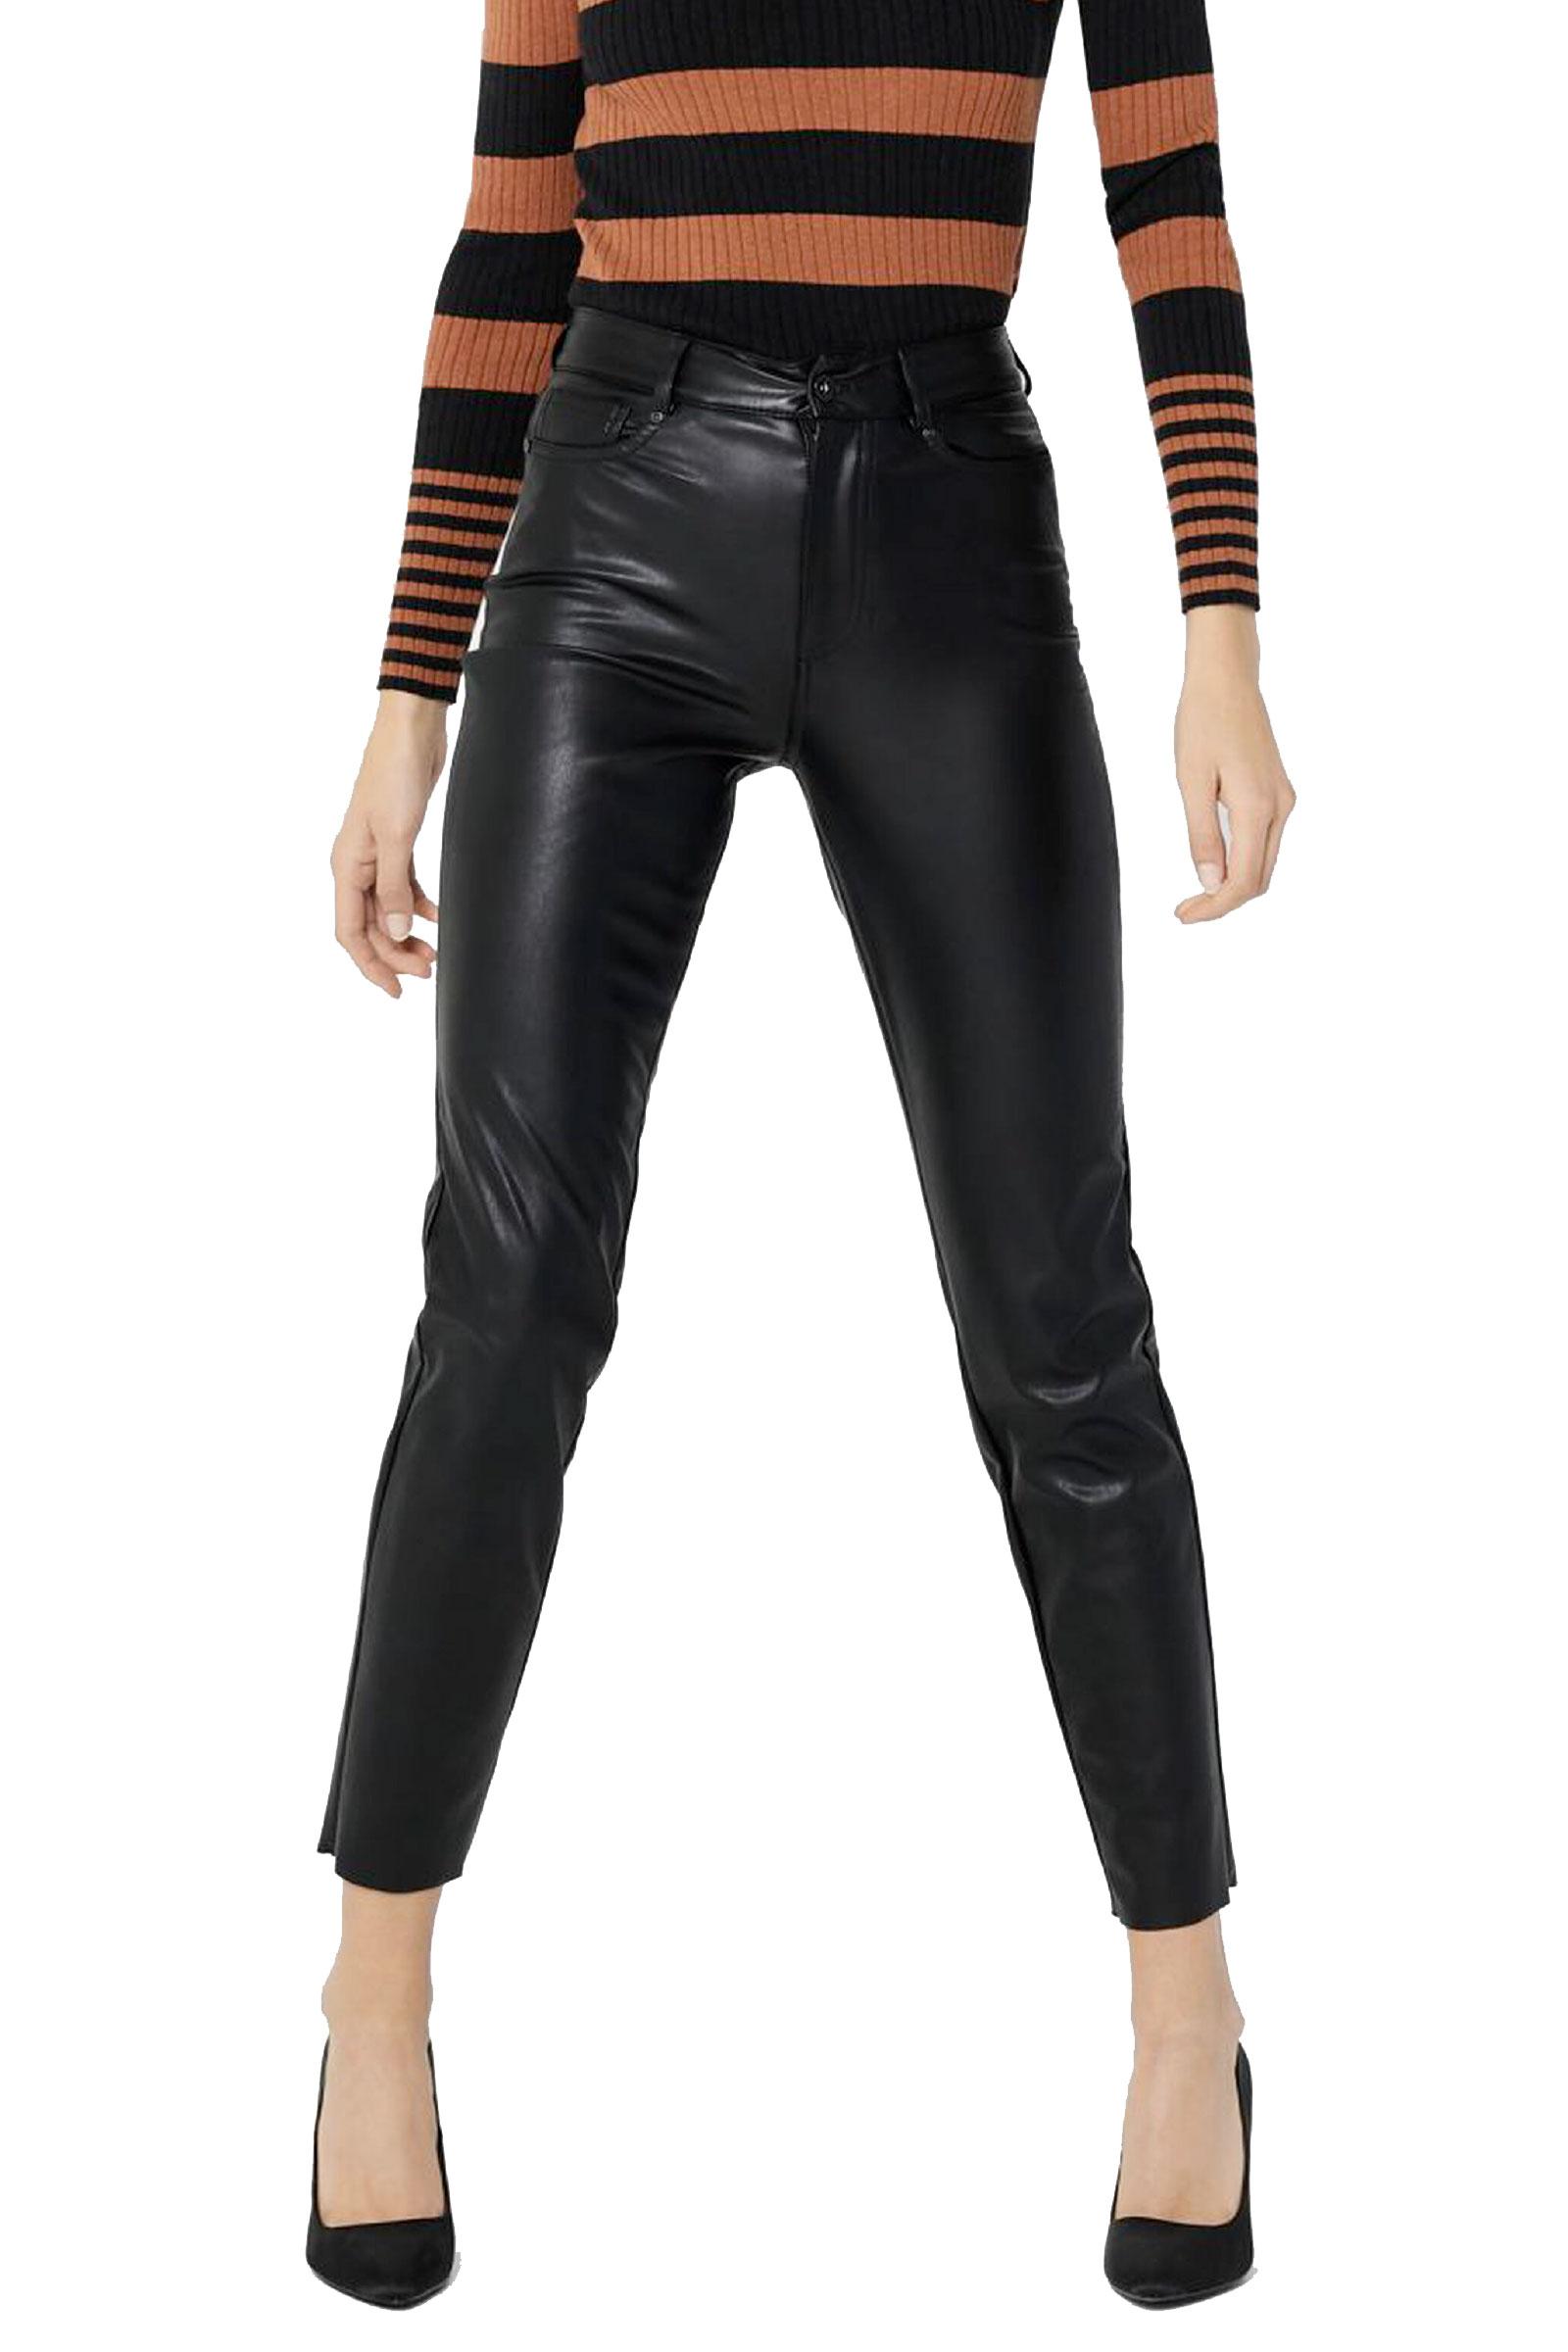 Pantalone Donna Modello EMILY ONLY | Pantalone | 15209293Black